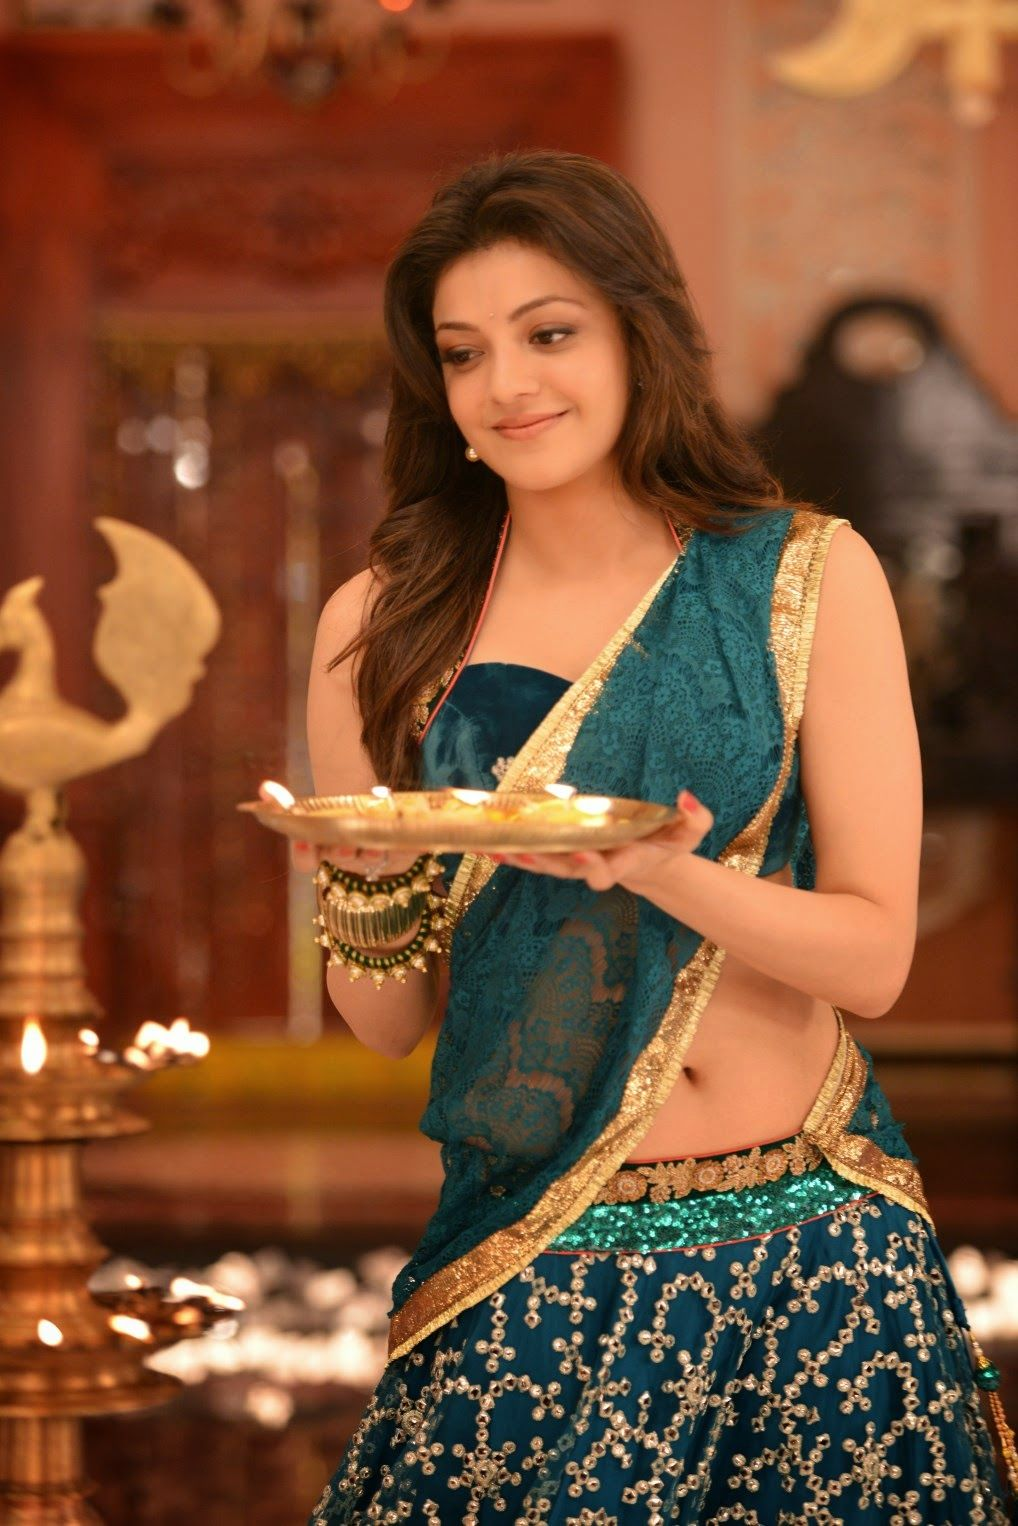 Kajal Agrawal New 2016 Hd Wallpapers Kajal Agarwal Saree Beautiful Indian Actress Kajal Agarwal Bikini